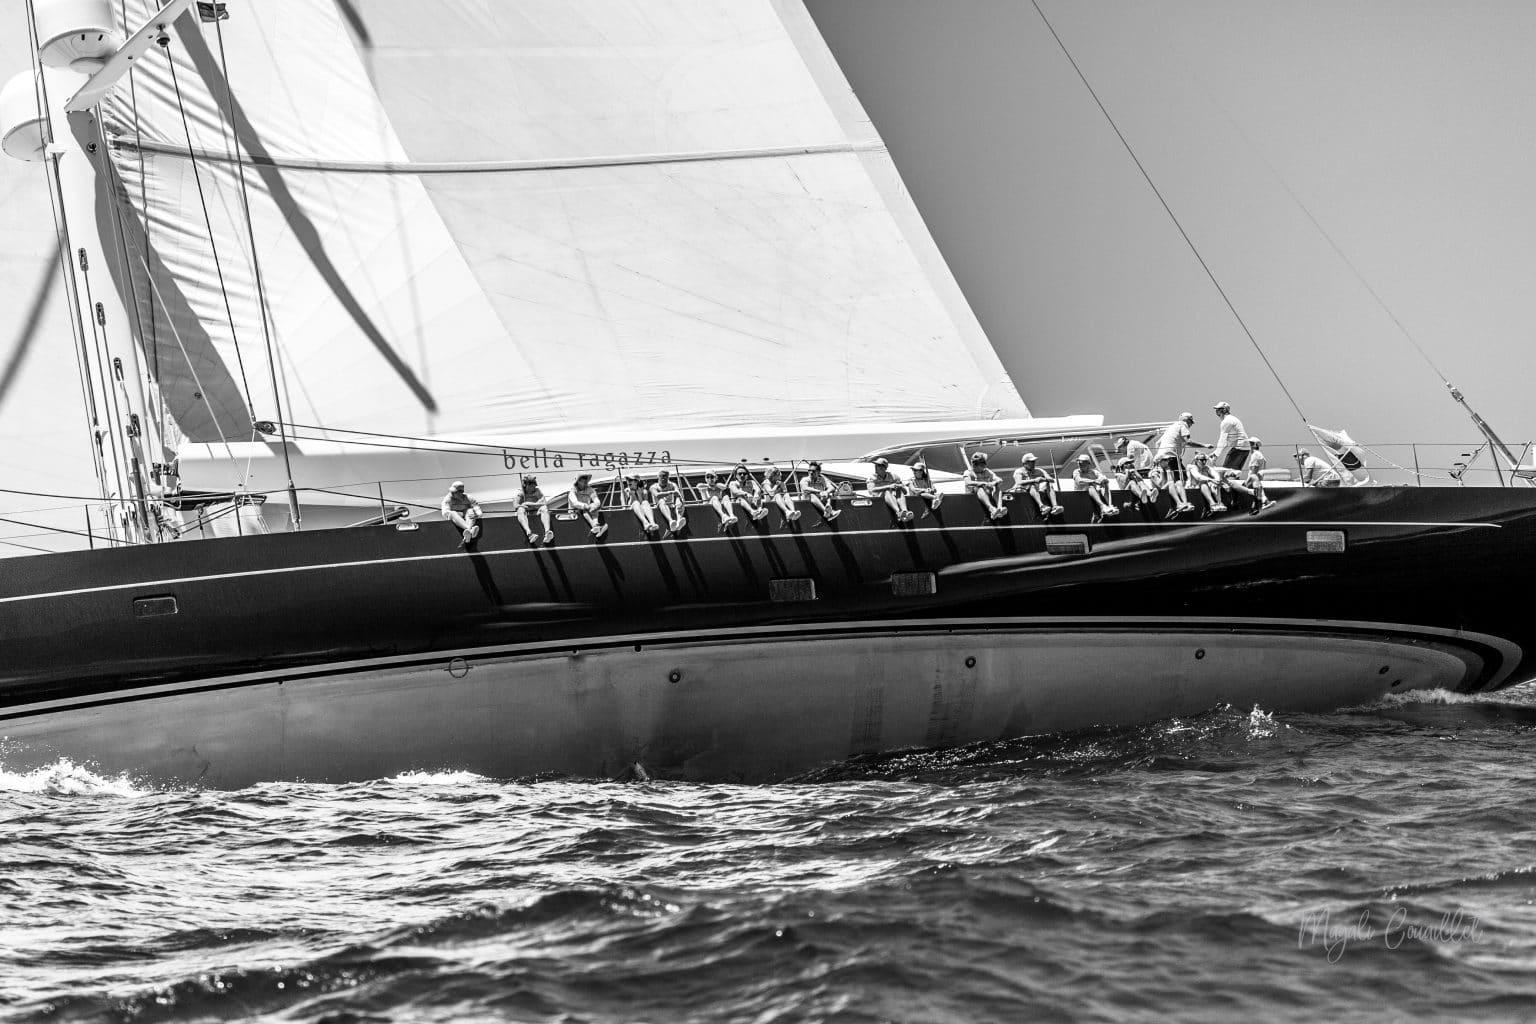 Bella Ragazza Yacht, Bucket Regatta 2019 St Barths-2